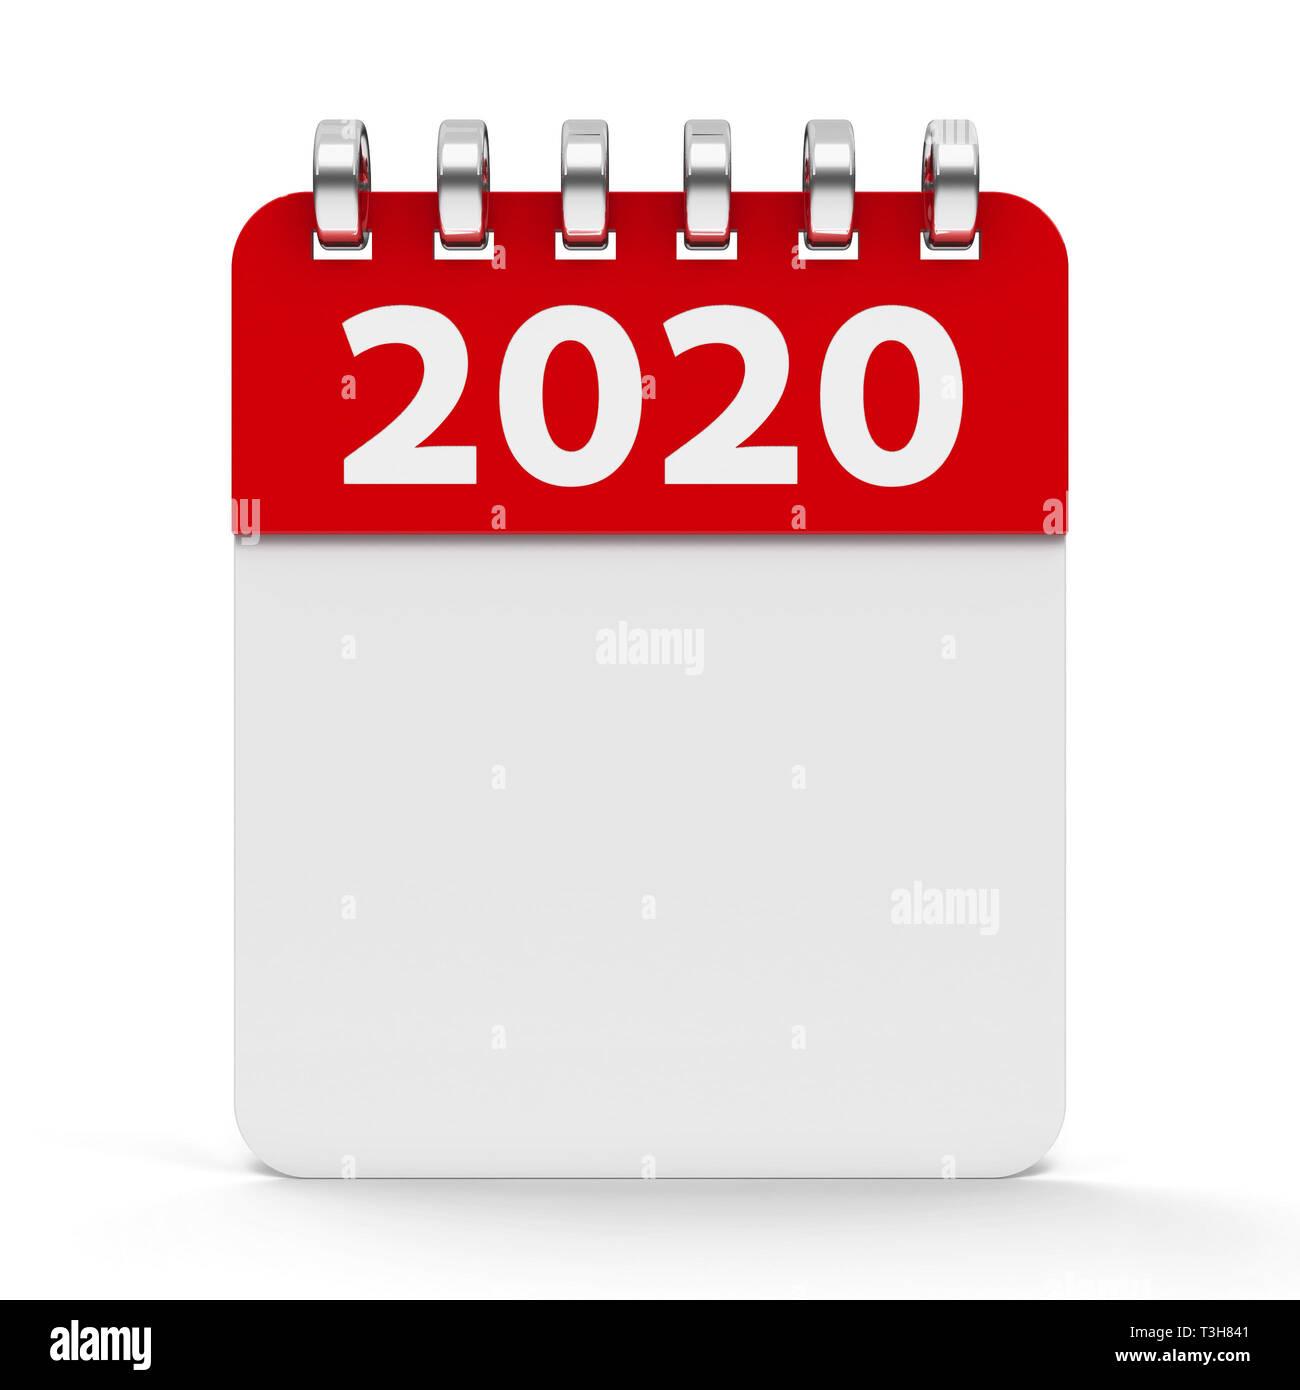 Calendario Bursatil 2020.2020 Year Imagenes De Stock 2020 Year Fotos De Stock Alamy